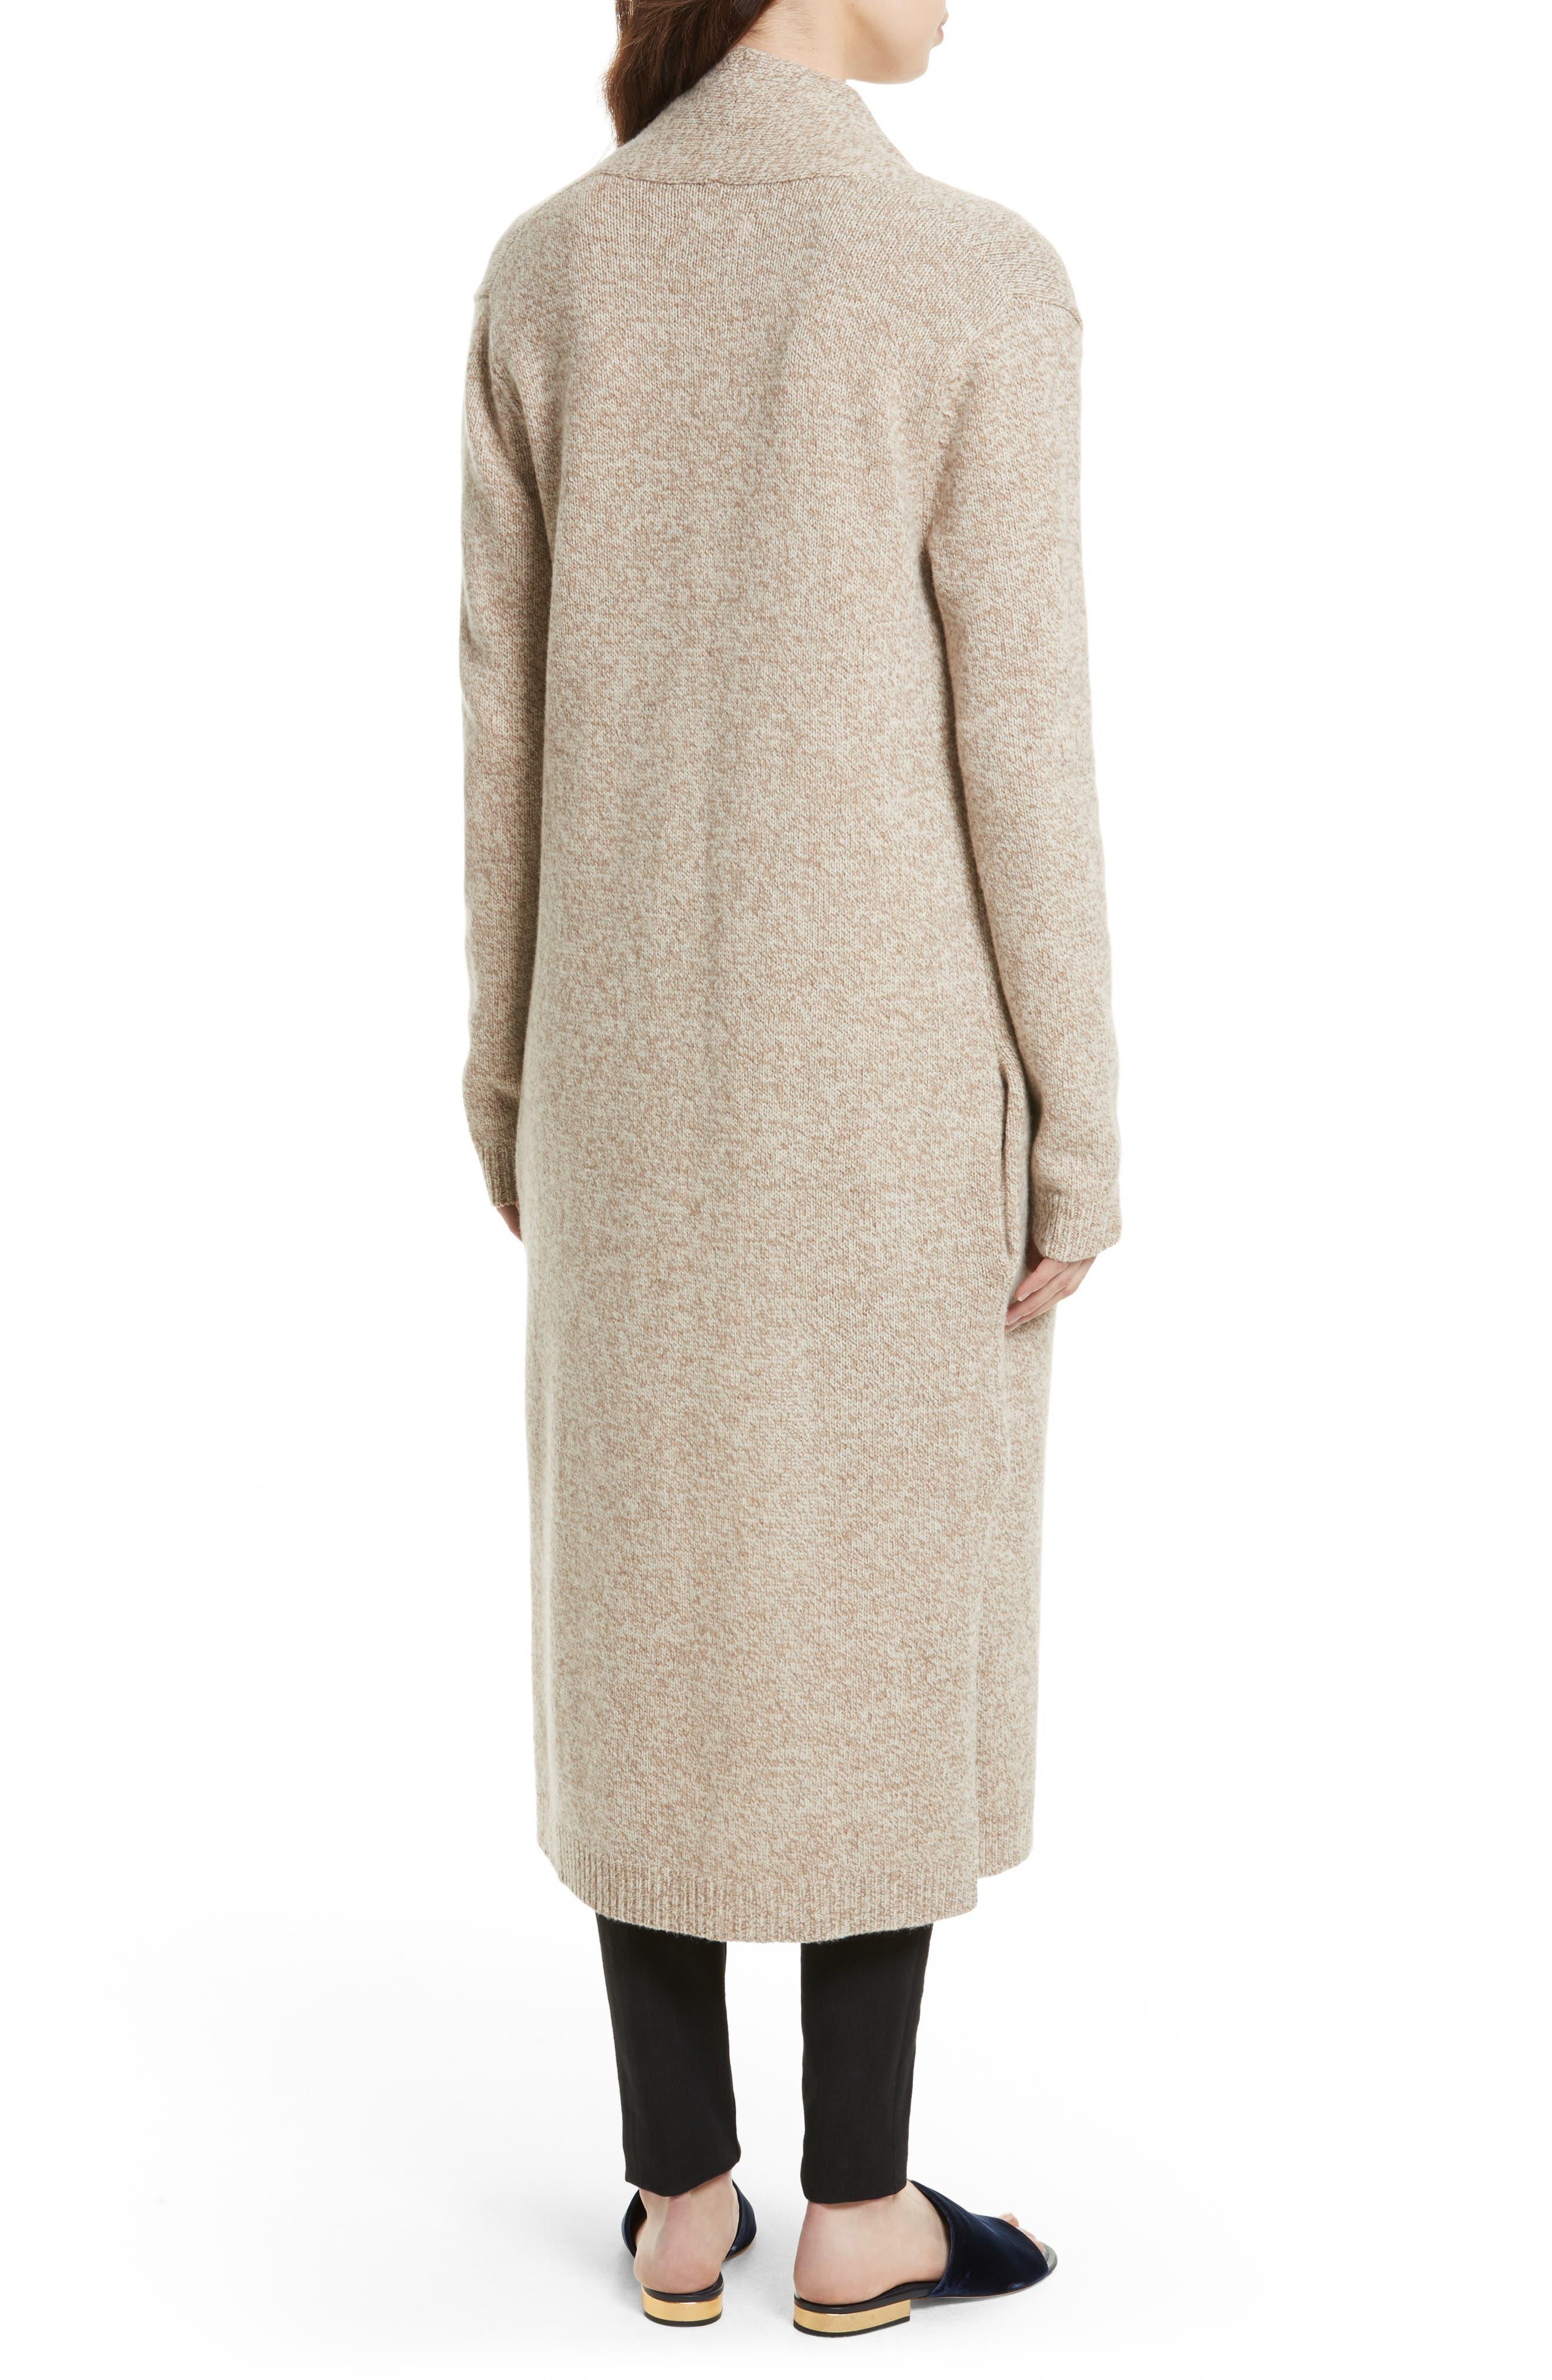 Thoren Long Wool Cardigan,                             Alternate thumbnail 2, color,                             Oatmeal Multi